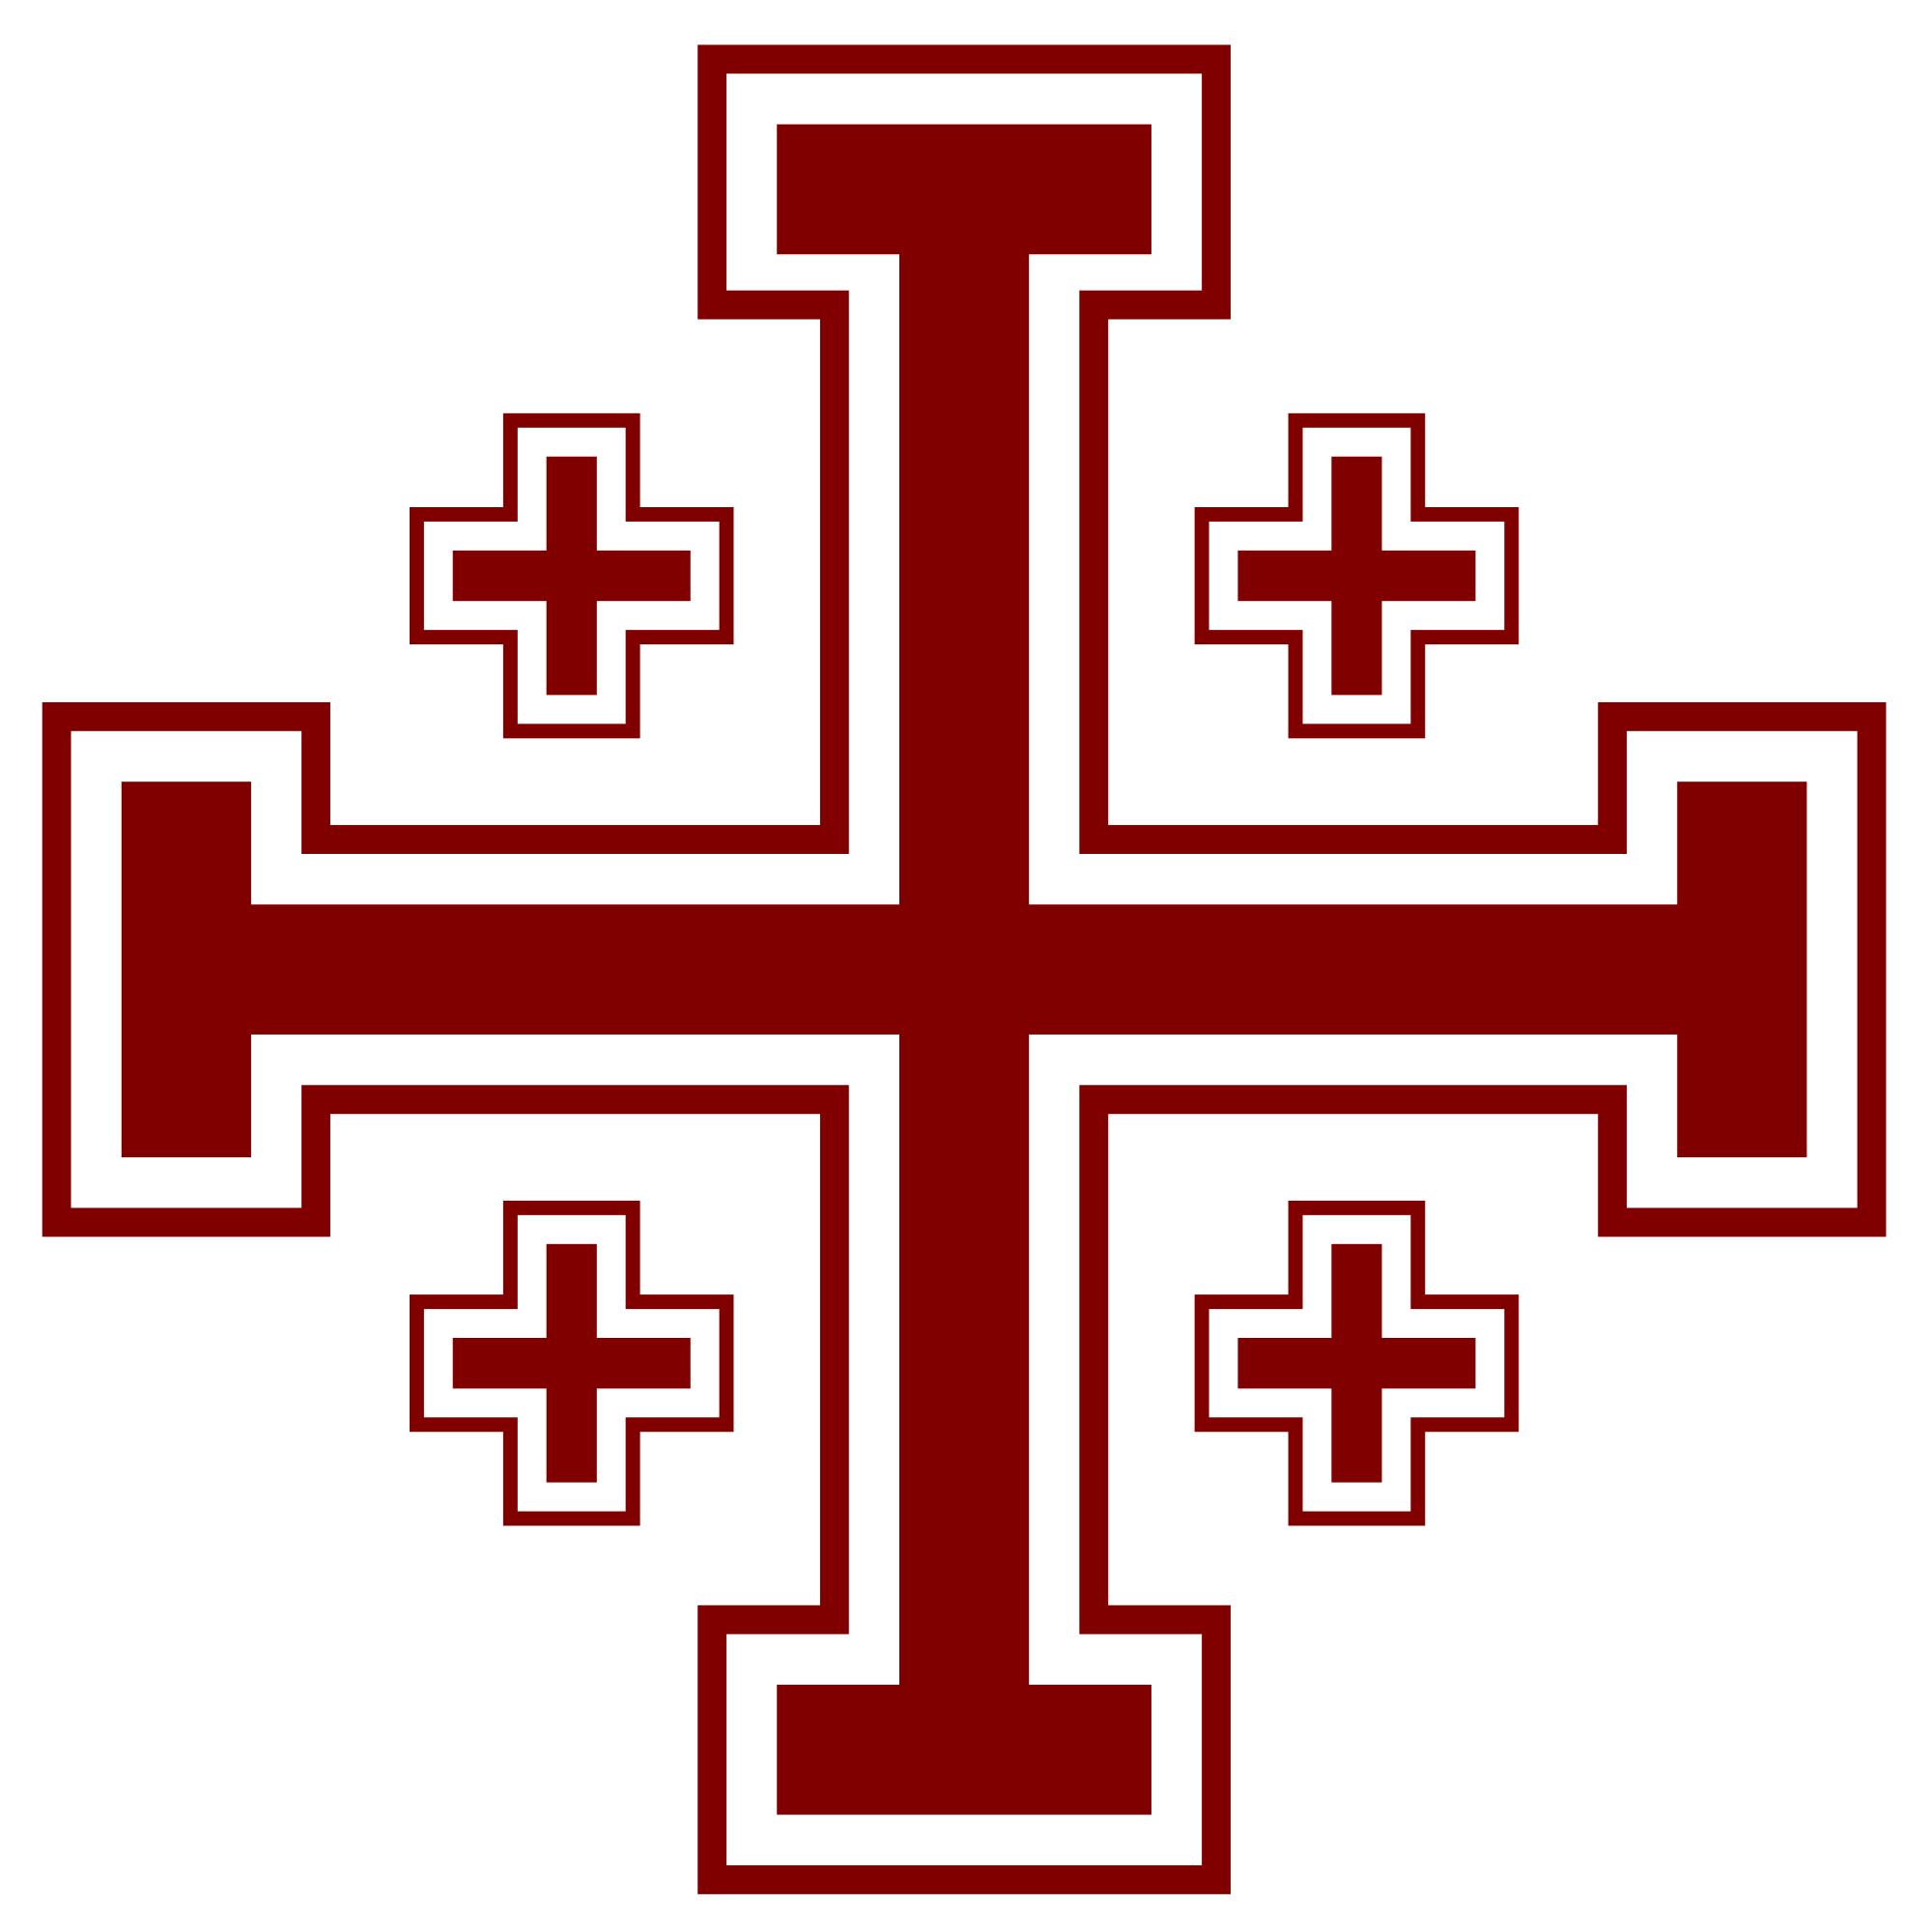 Catholic crusades clipart jpg download Free Crusader Cliparts, Download Free Clip Art, Free Clip Art on ... jpg download